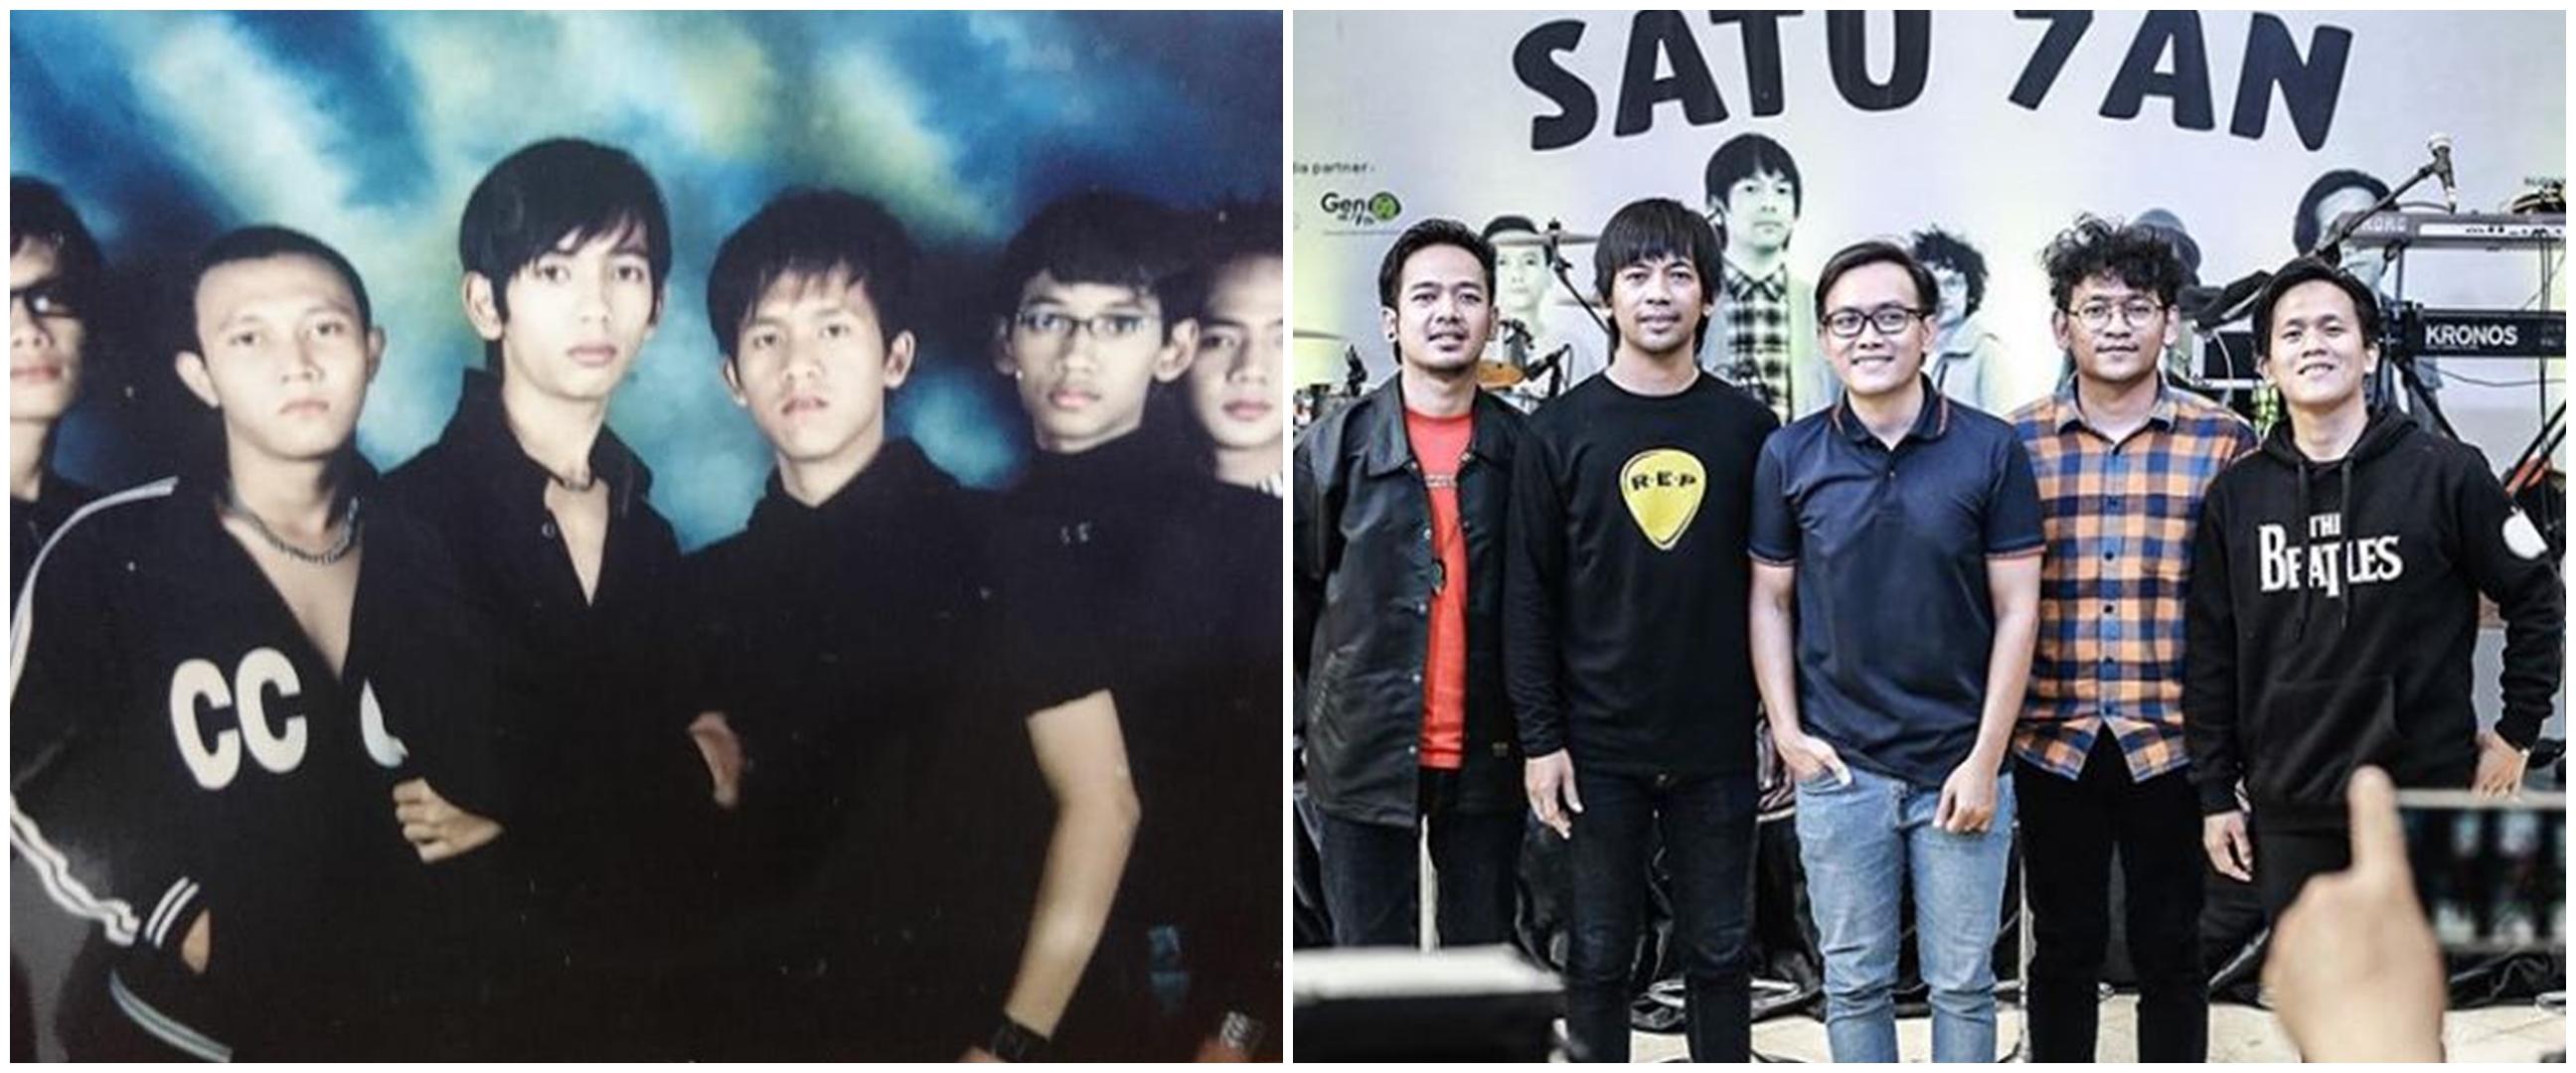 Potret 10 band era 2000-an saat awal karier vs kini